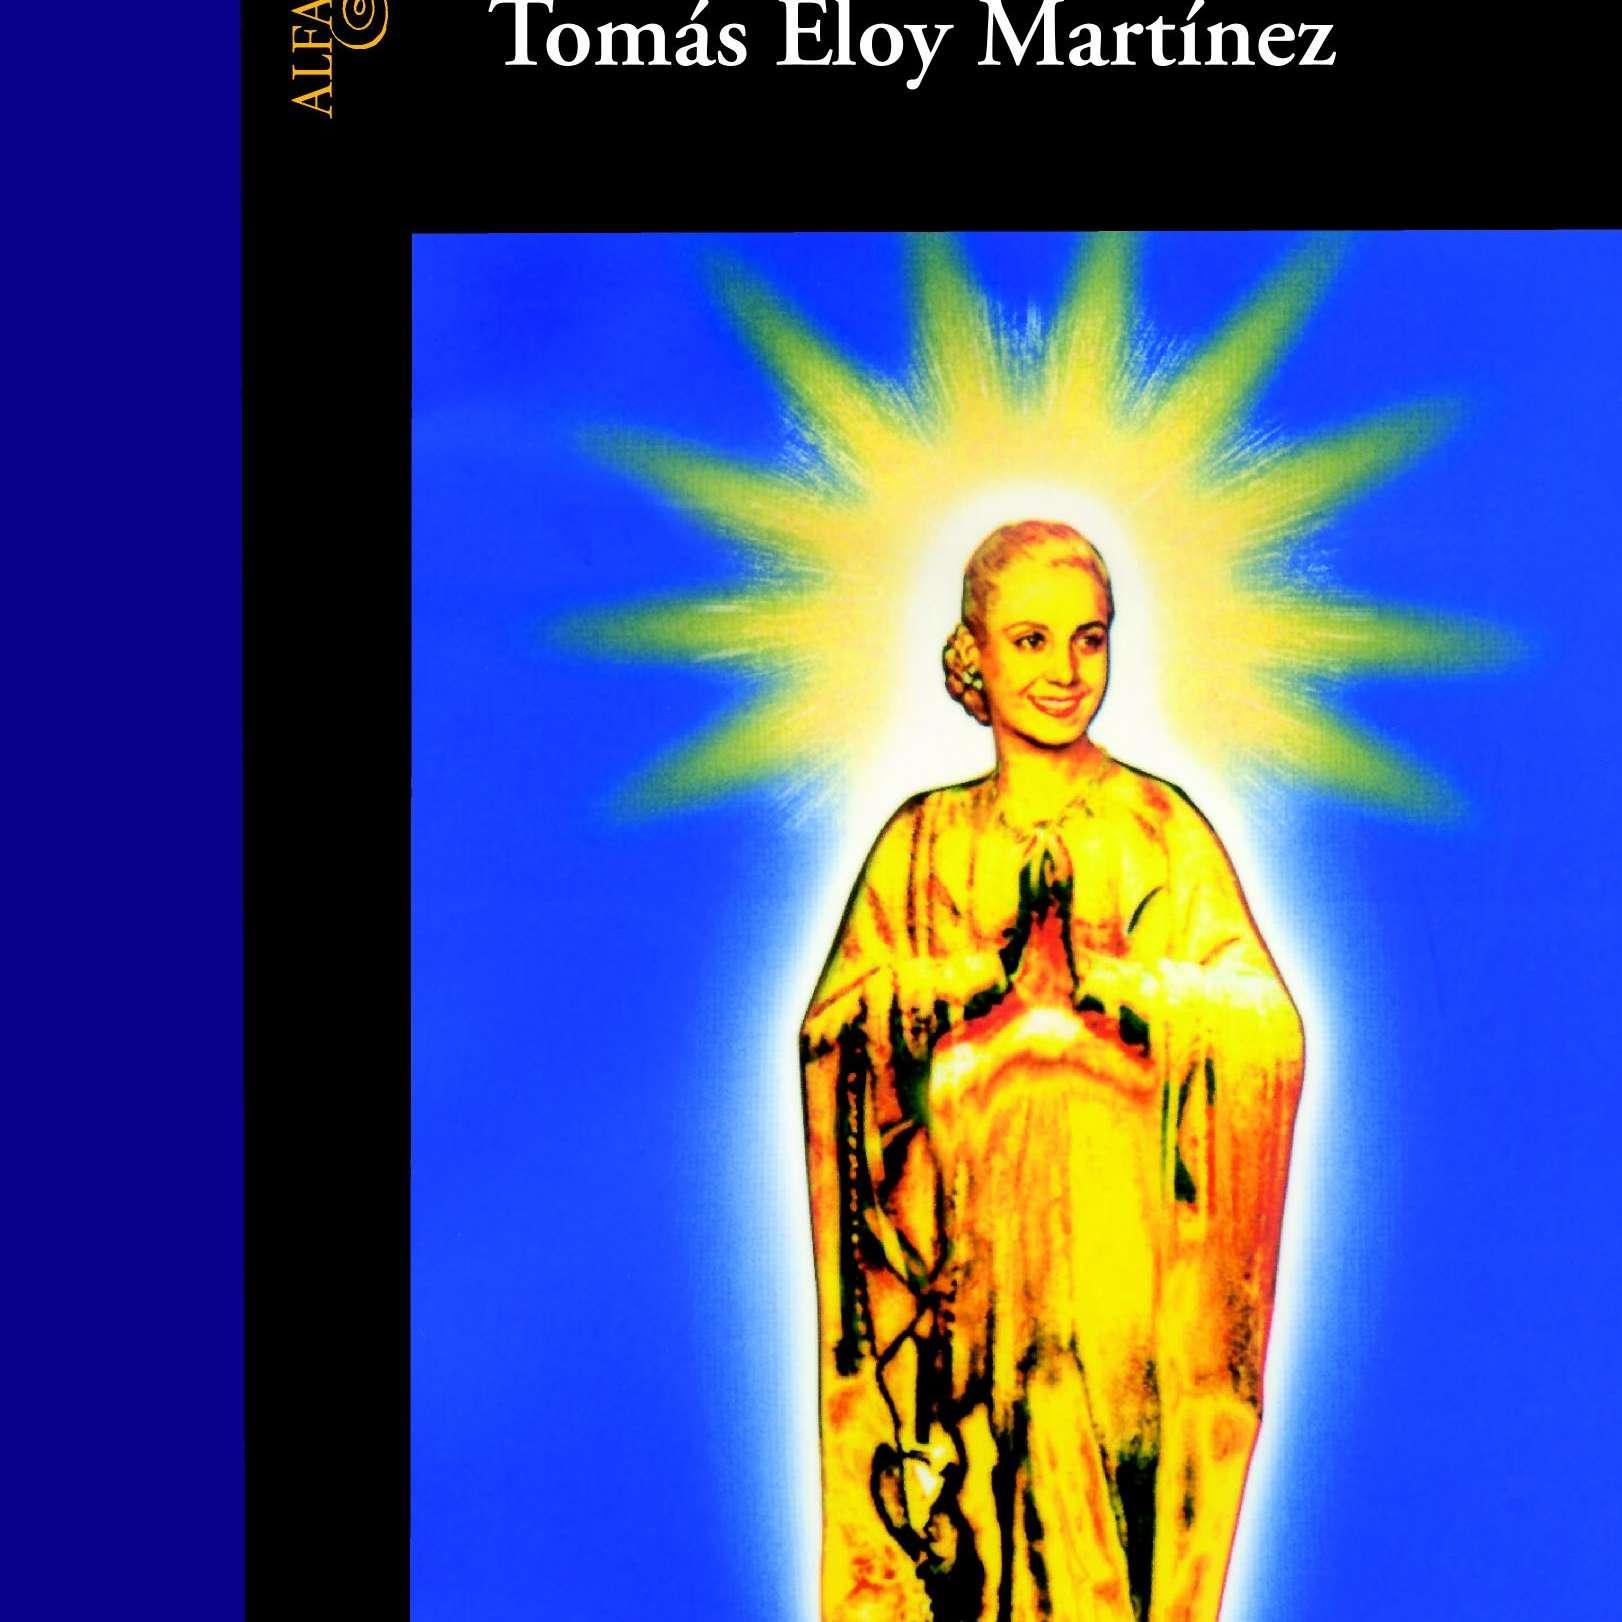 Santa Evita de Tomas Eloy Martinez